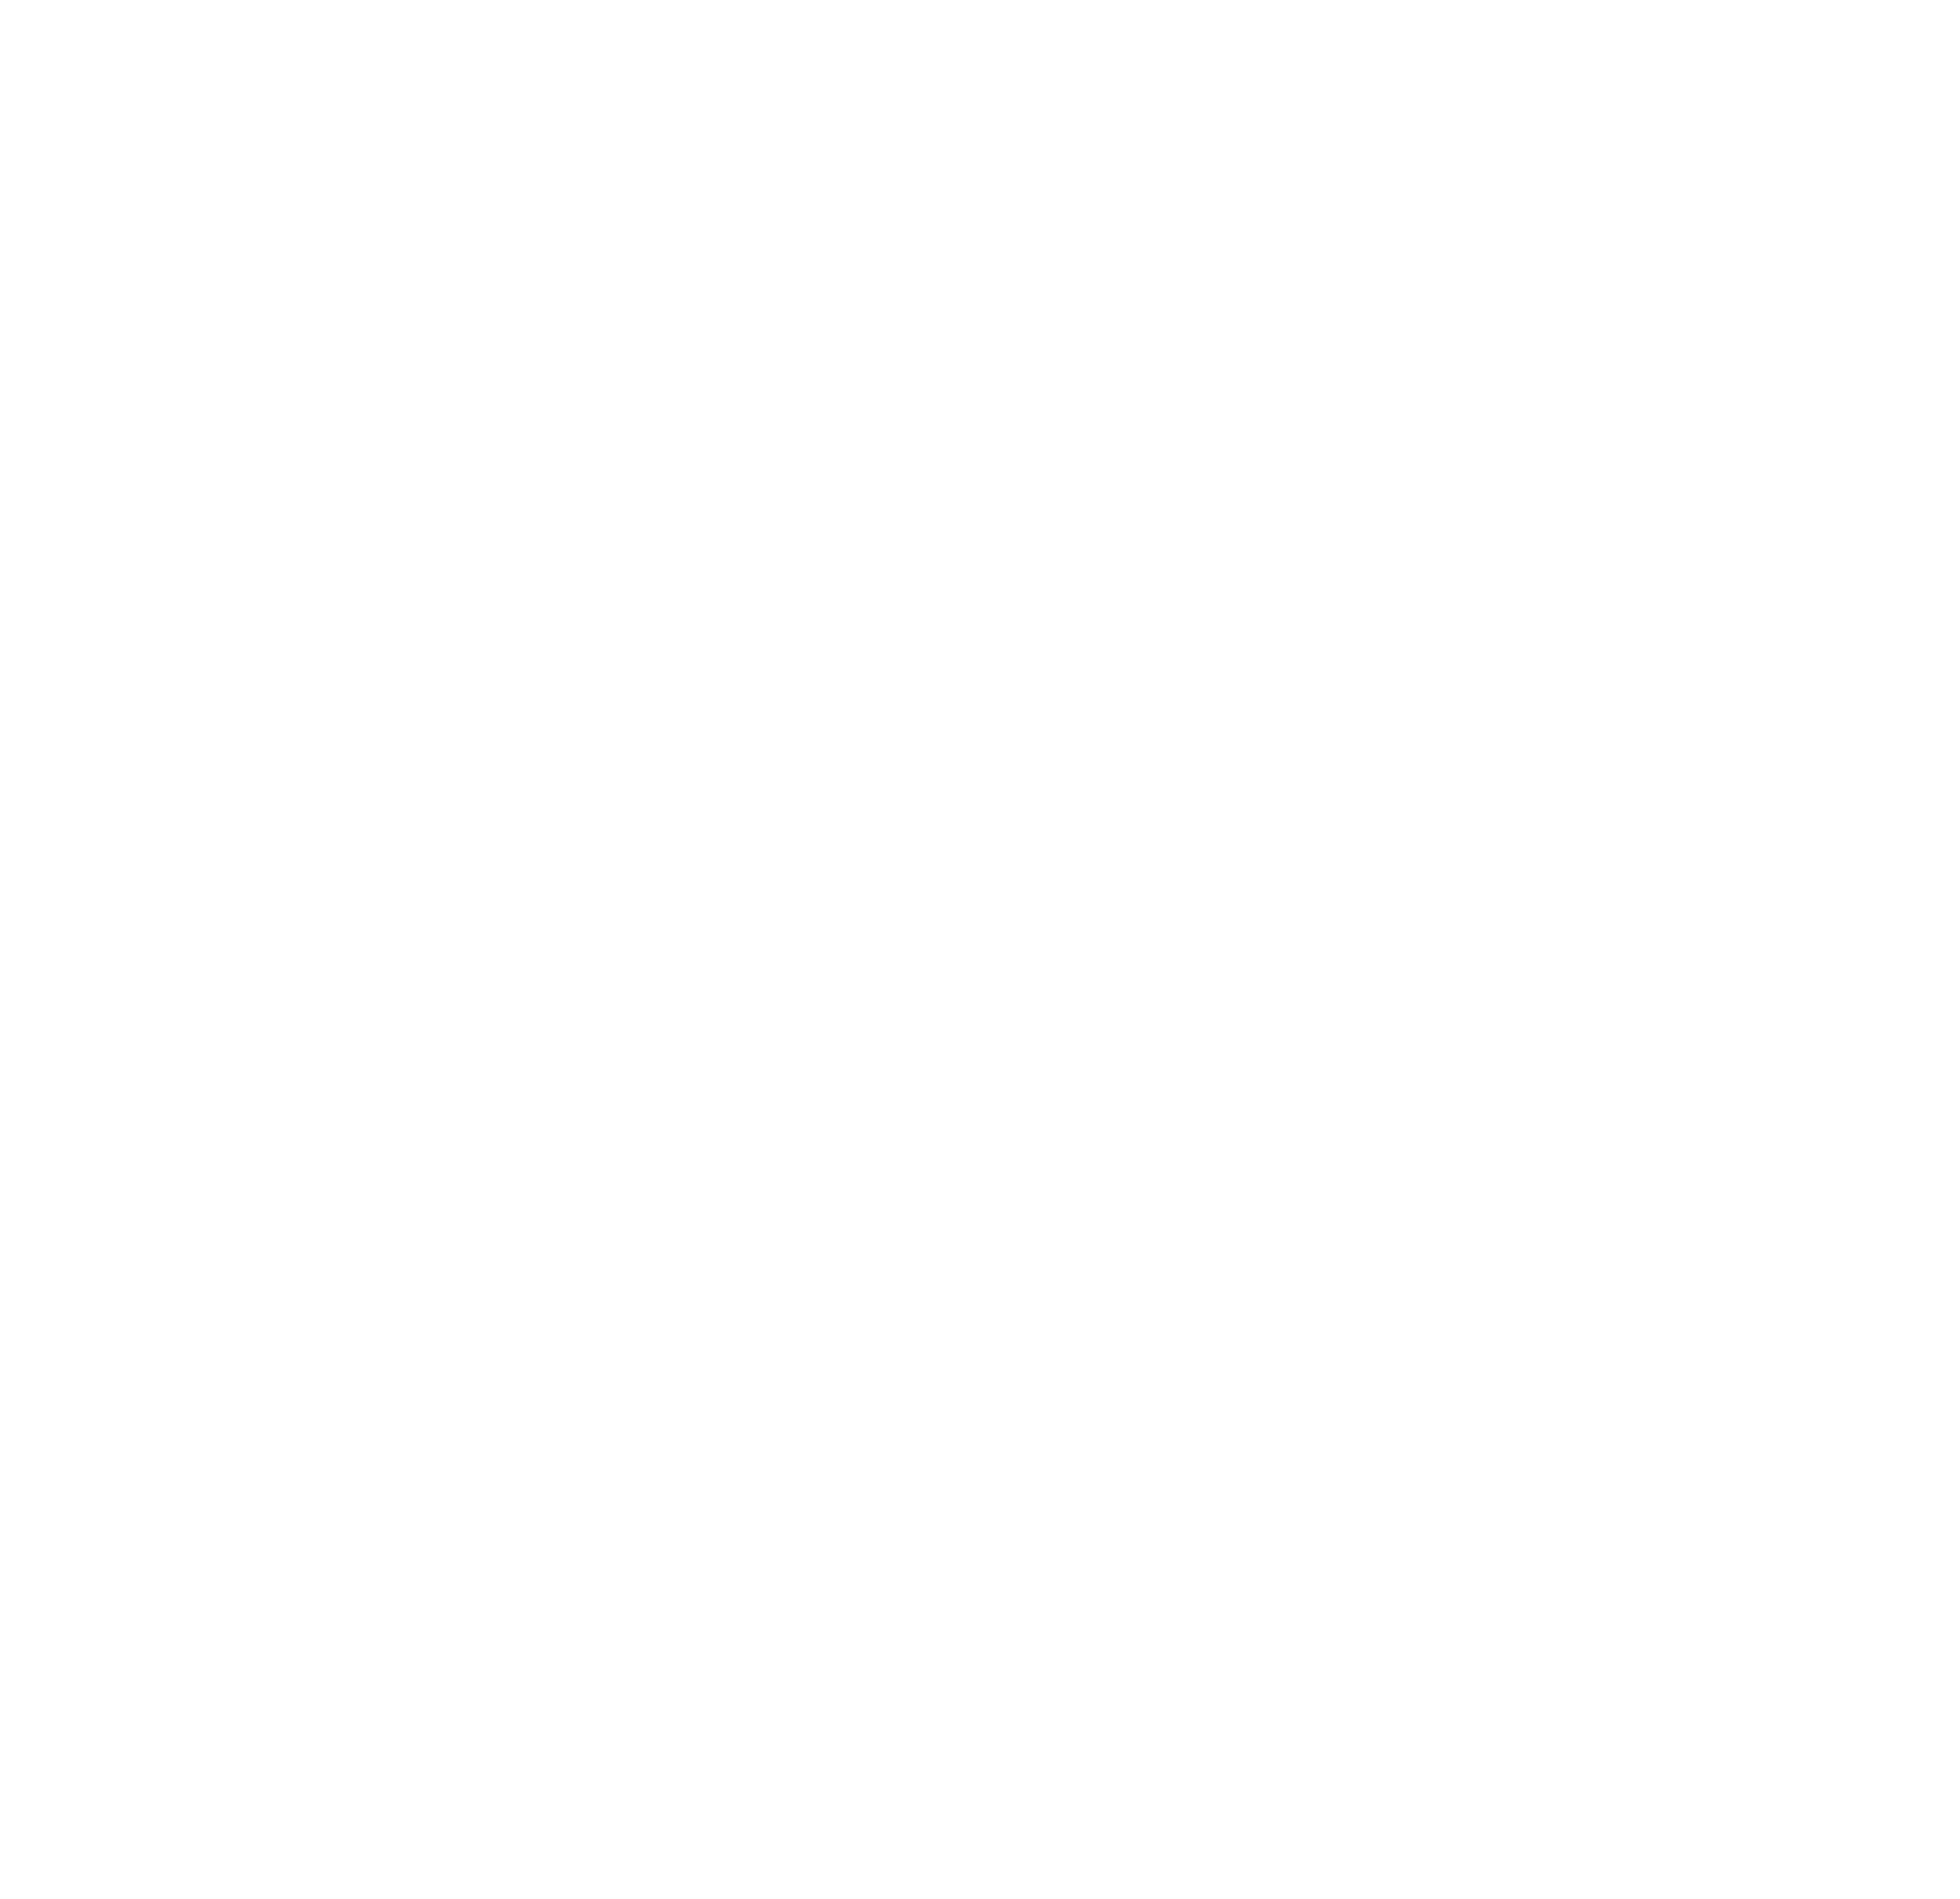 vmd_logo_2021_rev